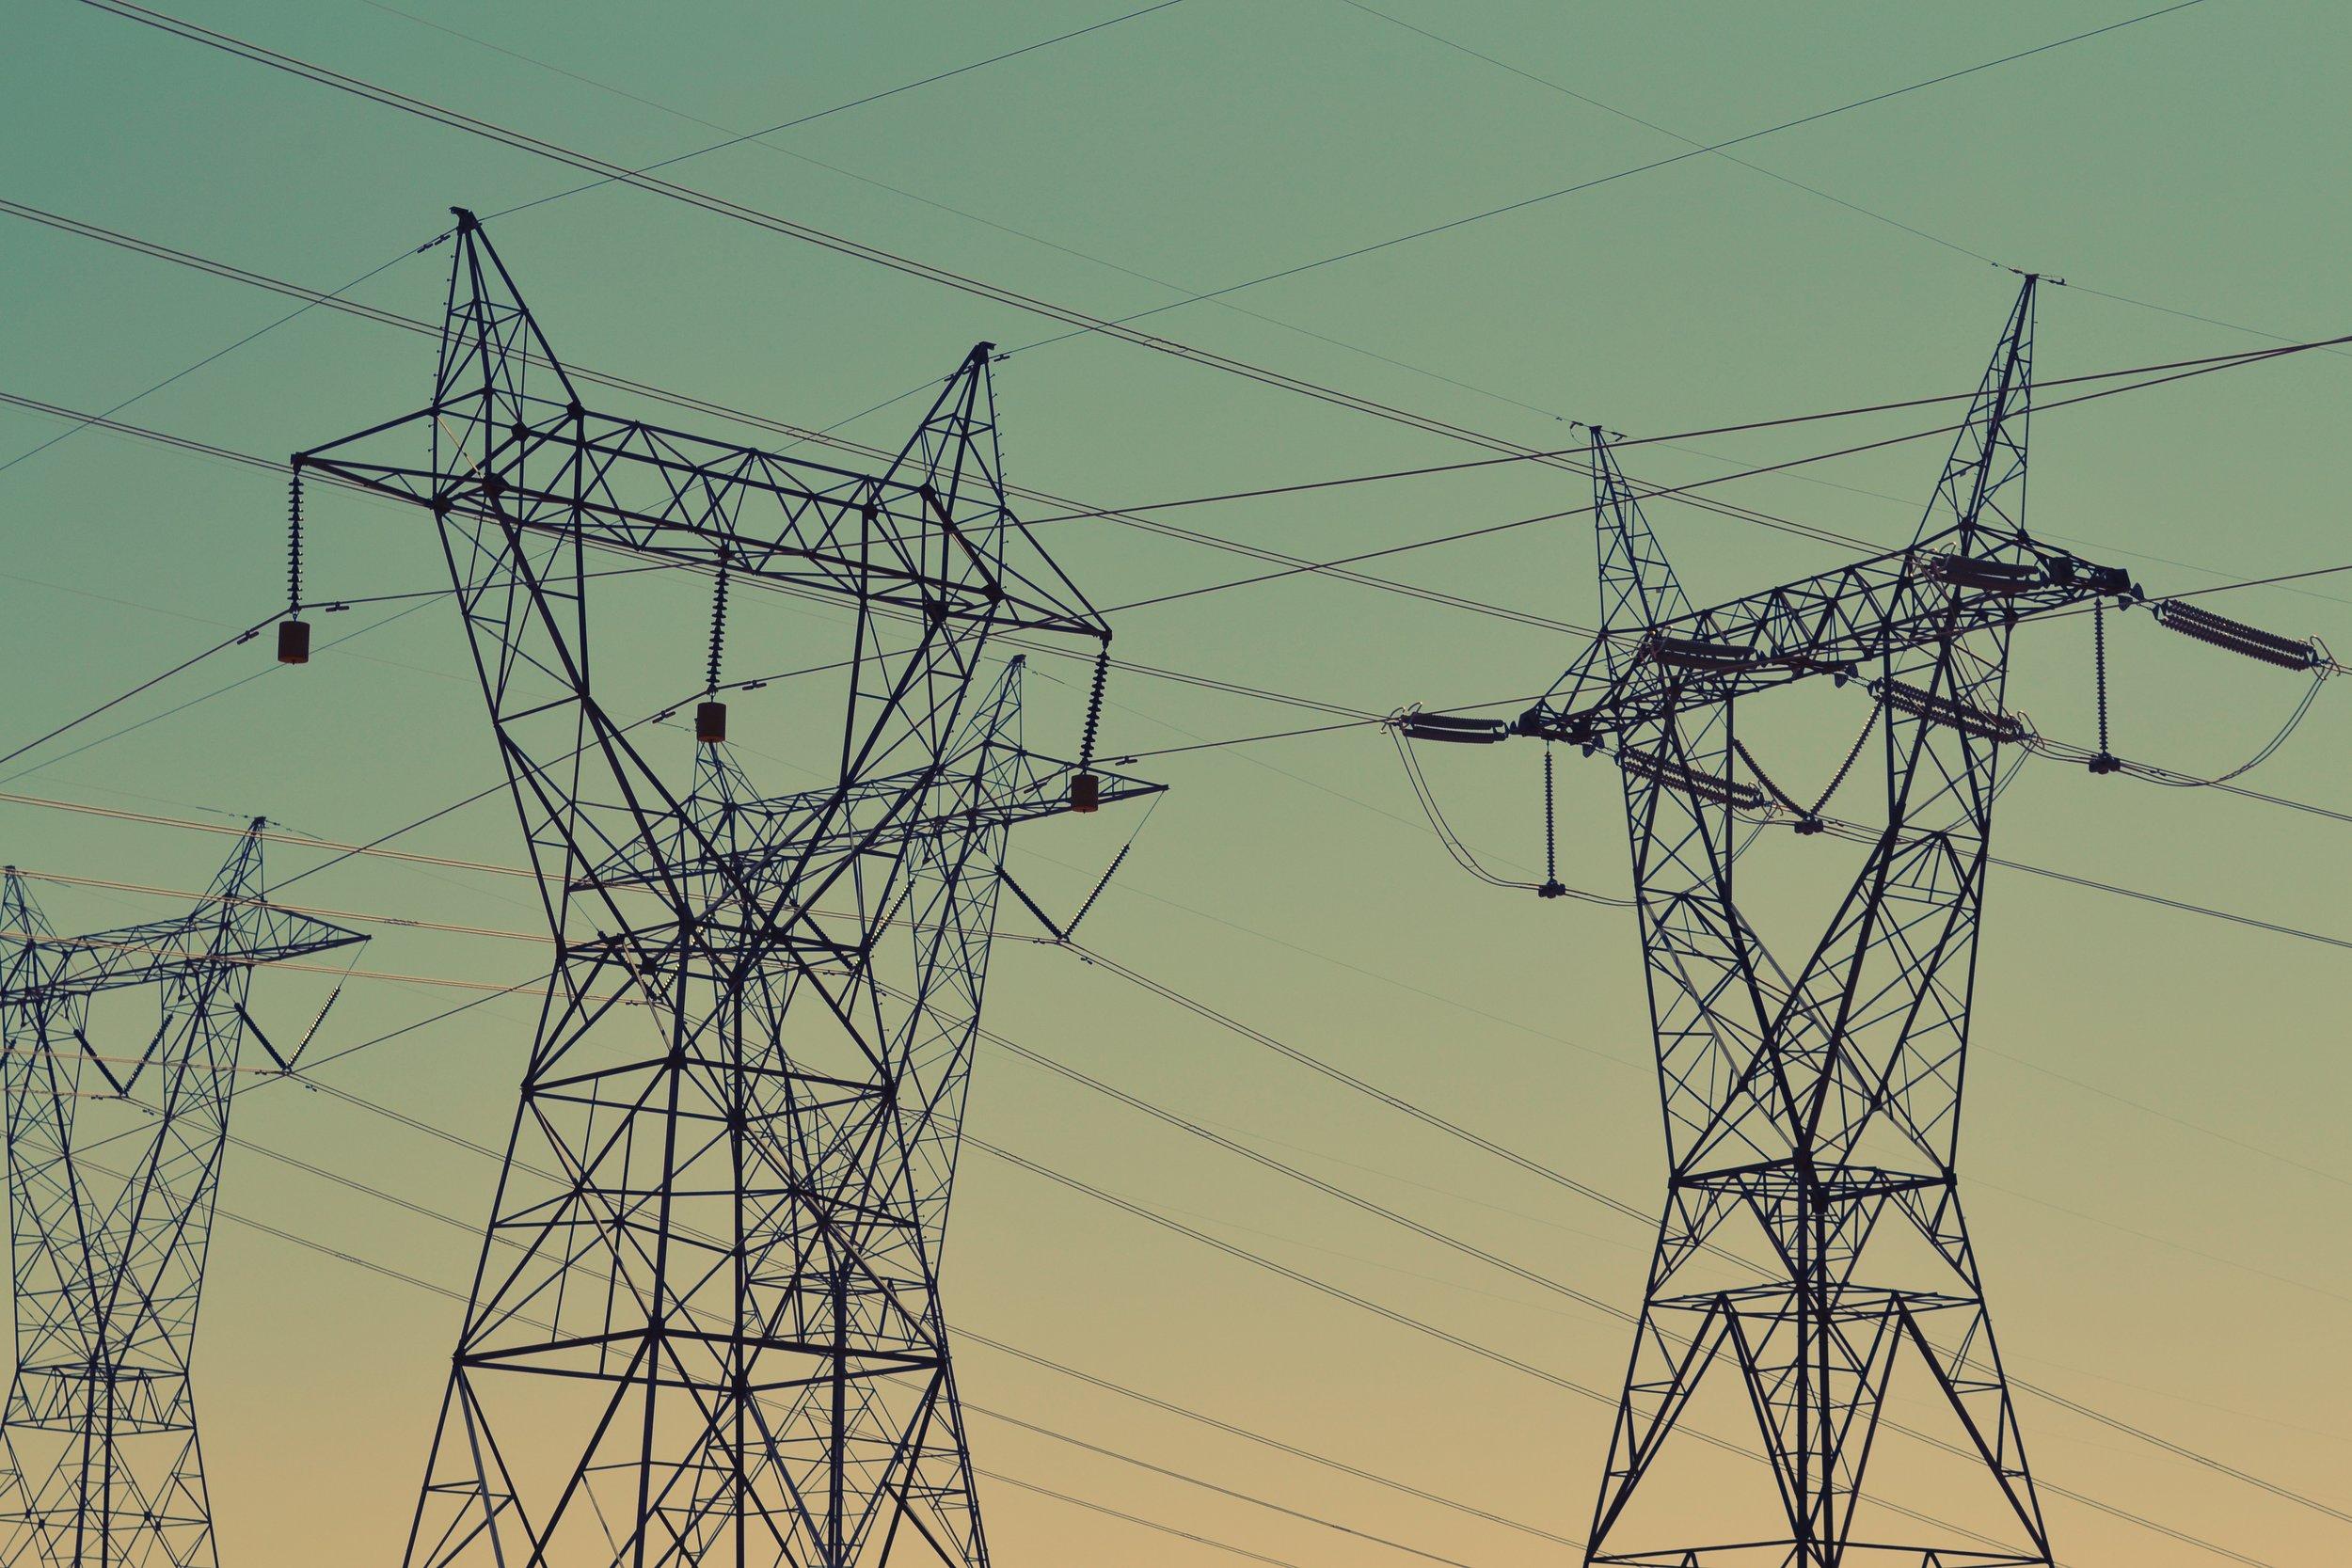 wire-line-tower-power-line-mast-electricity-99830-pxhere.com.jpg